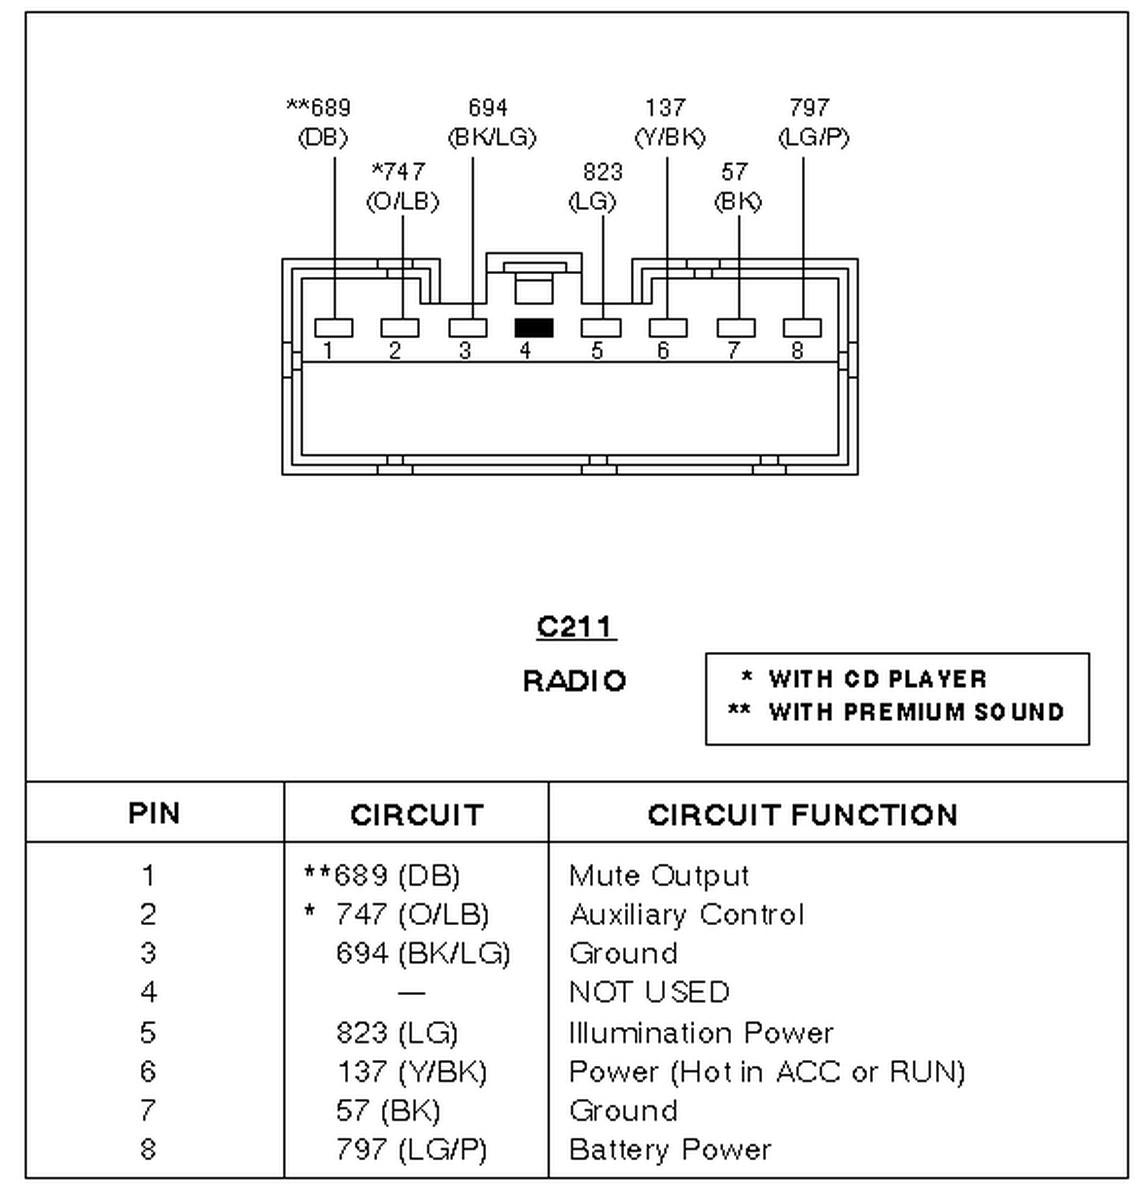 2003 ford F150 Radio Wiring Diagram | Free Wiring Diagram